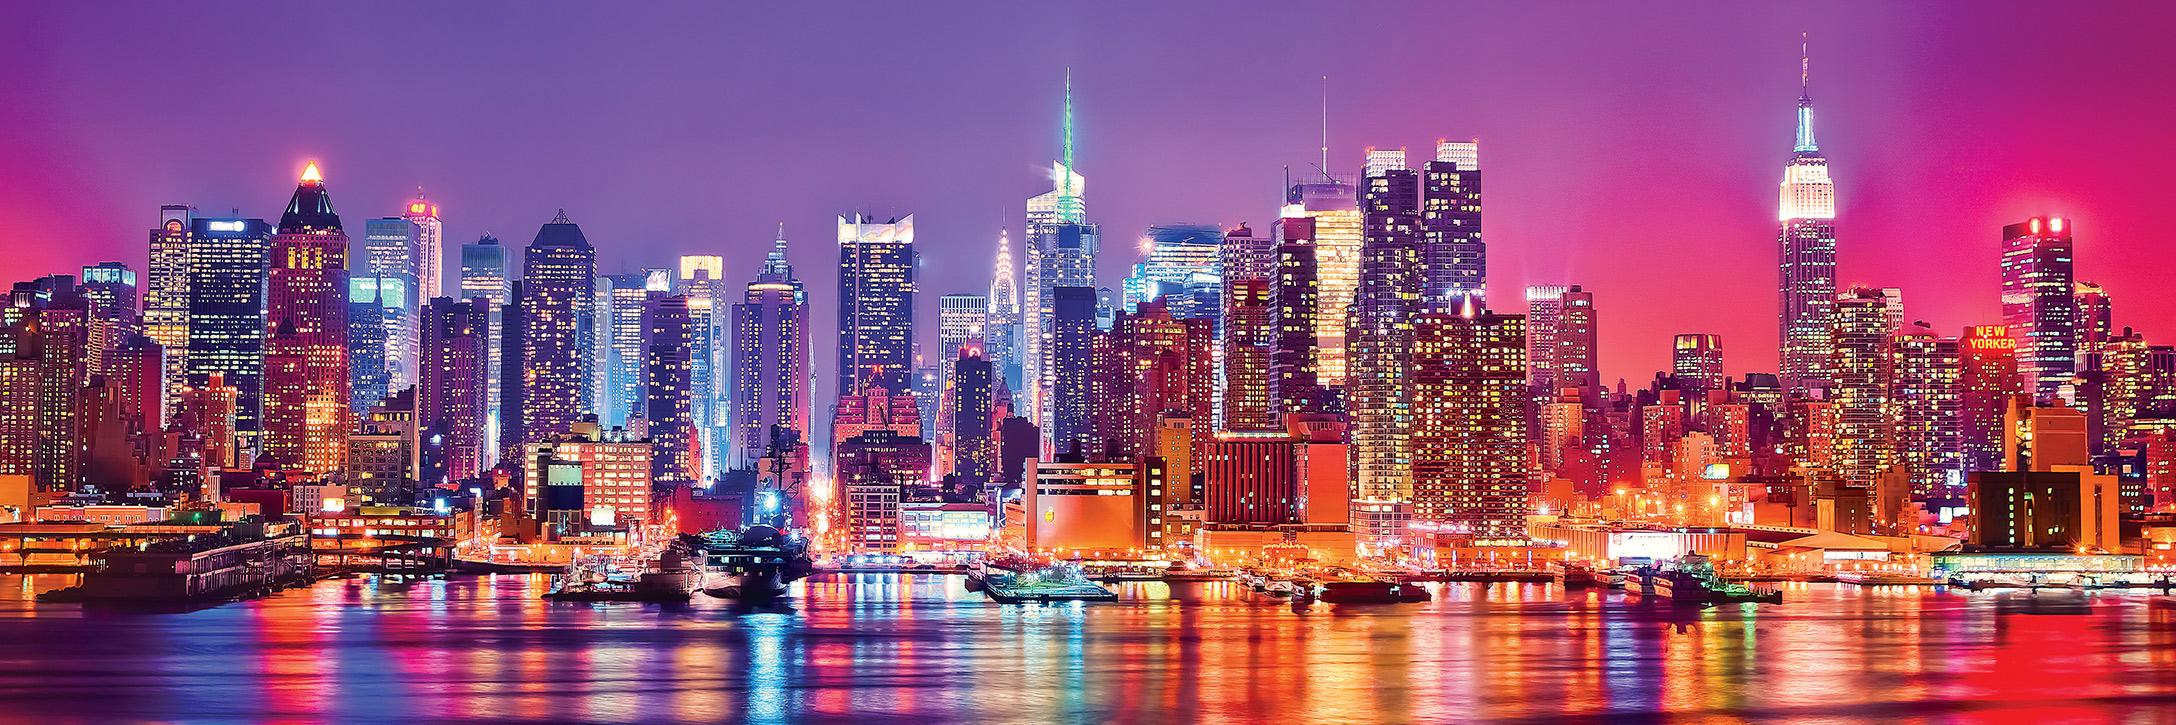 New York Skyline / Cityscape Jigsaw Puzzle